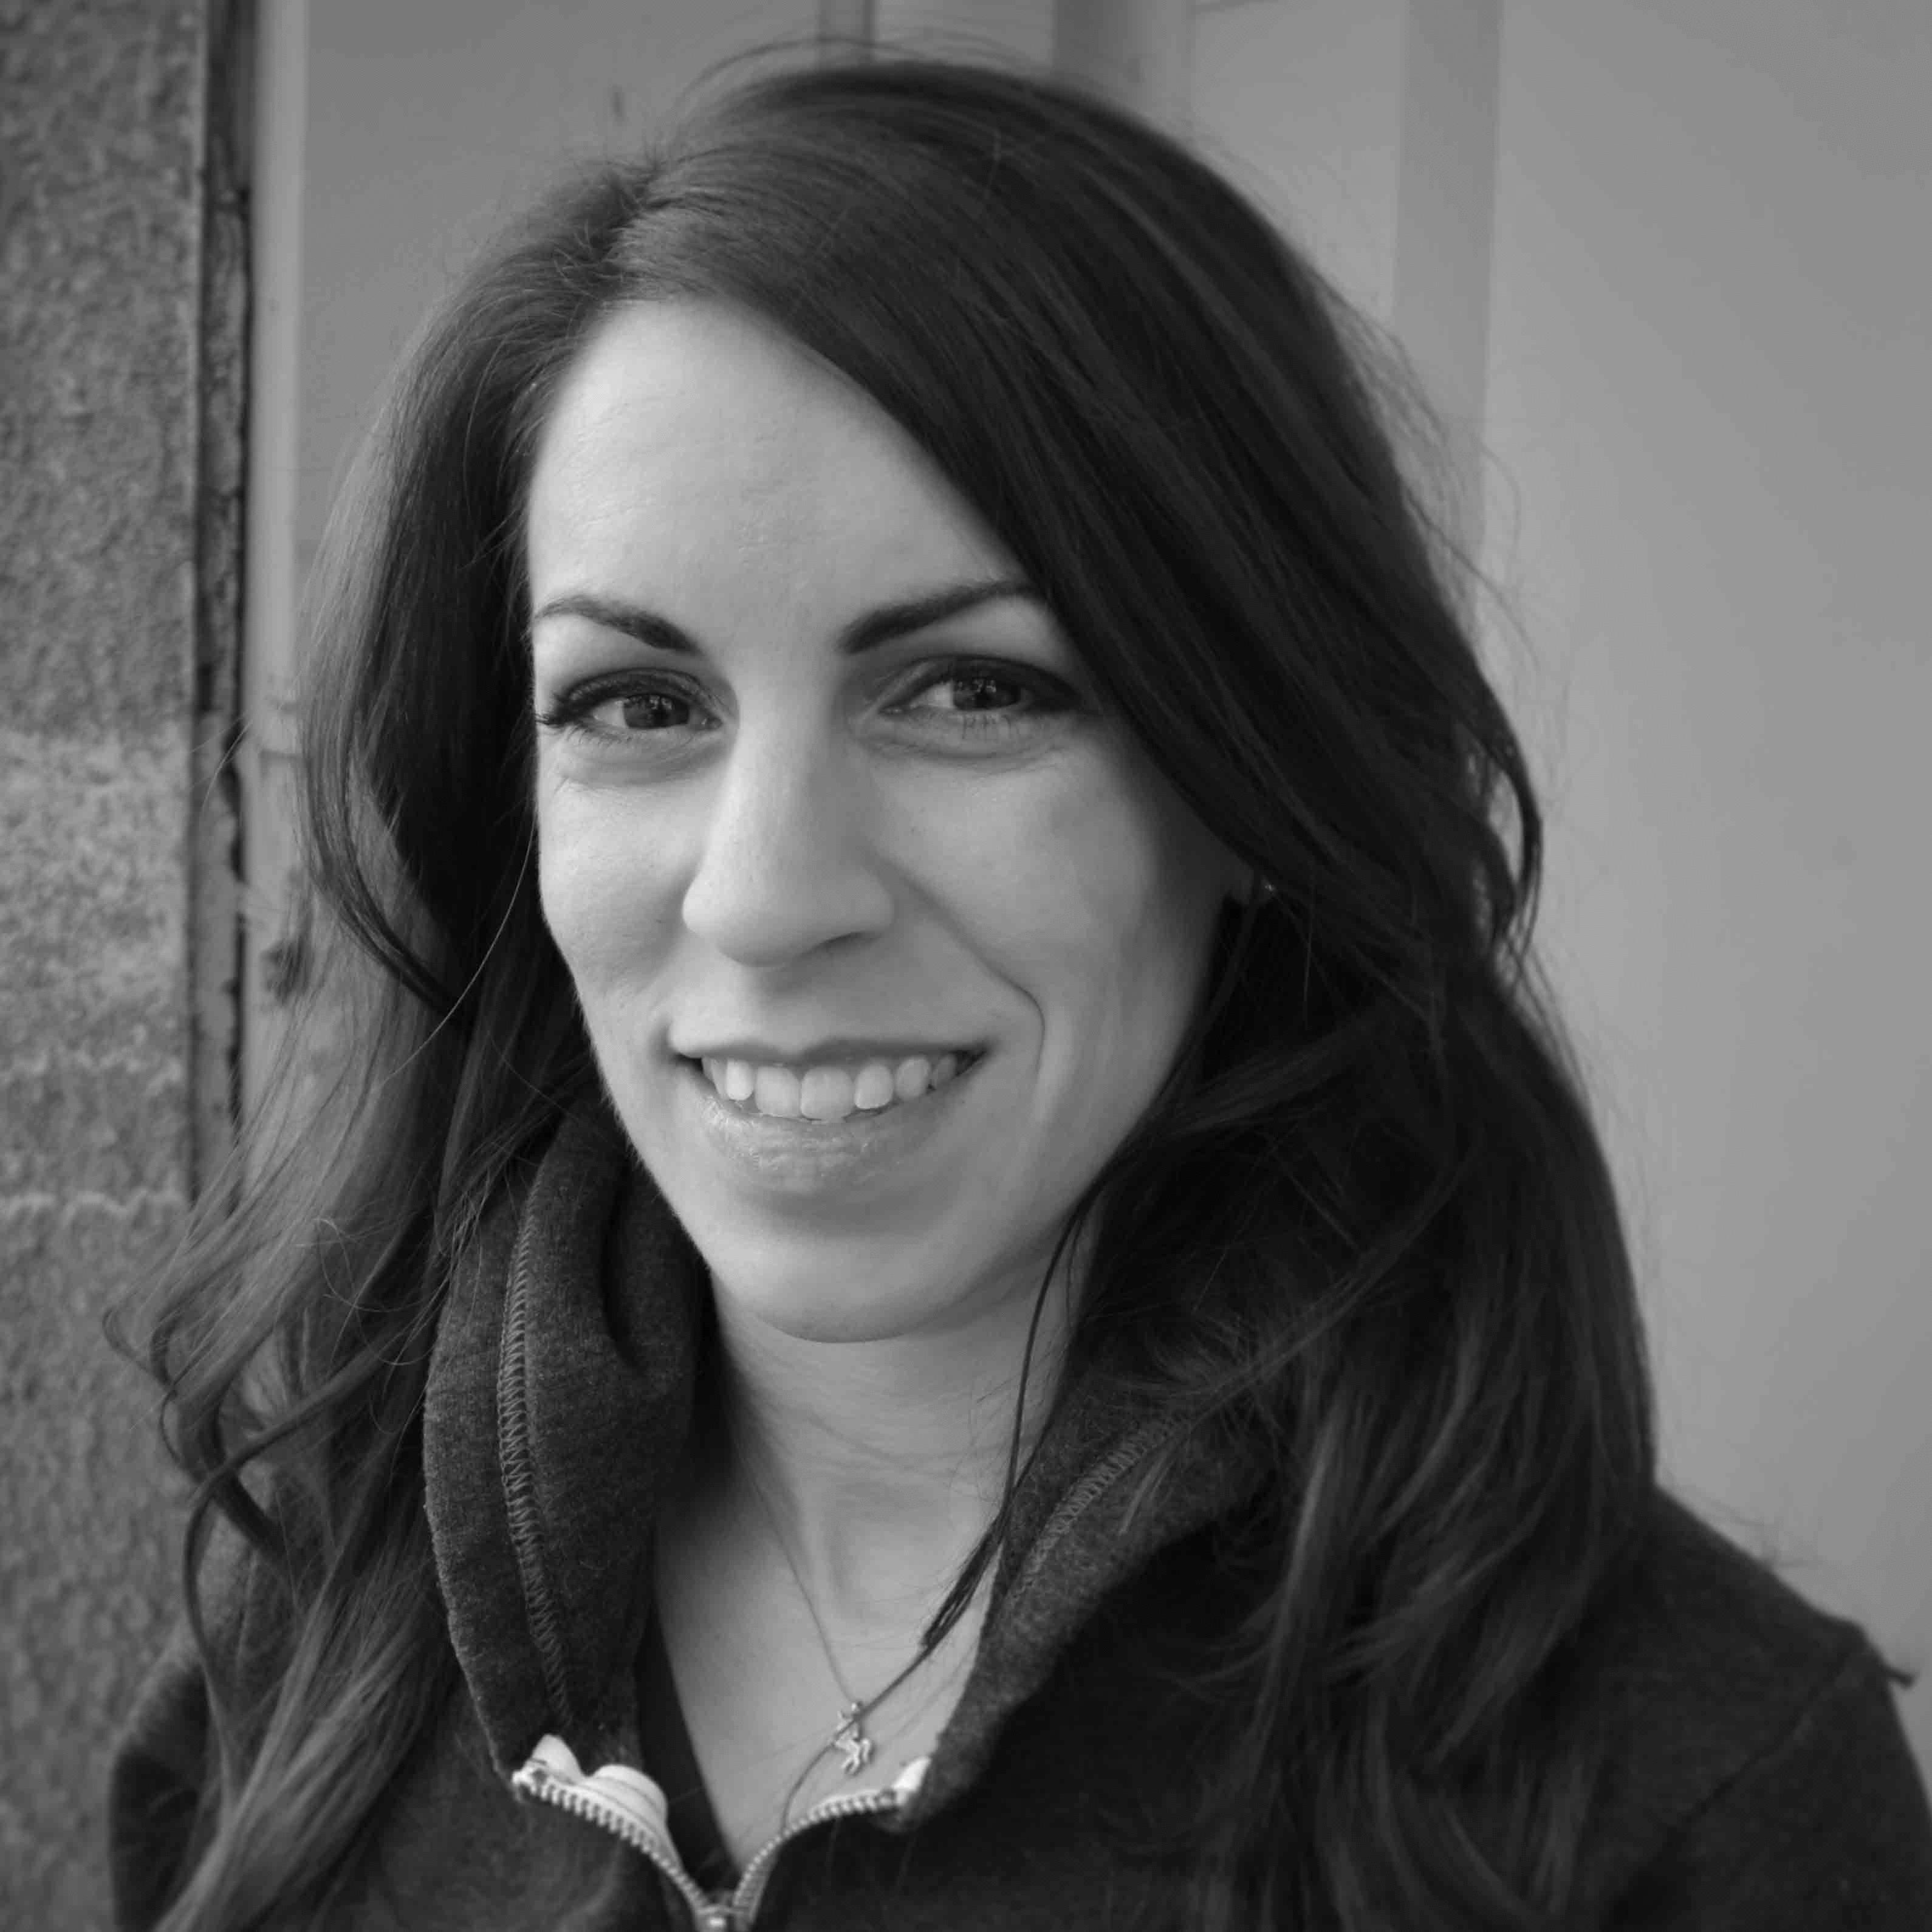 Megan Starshak